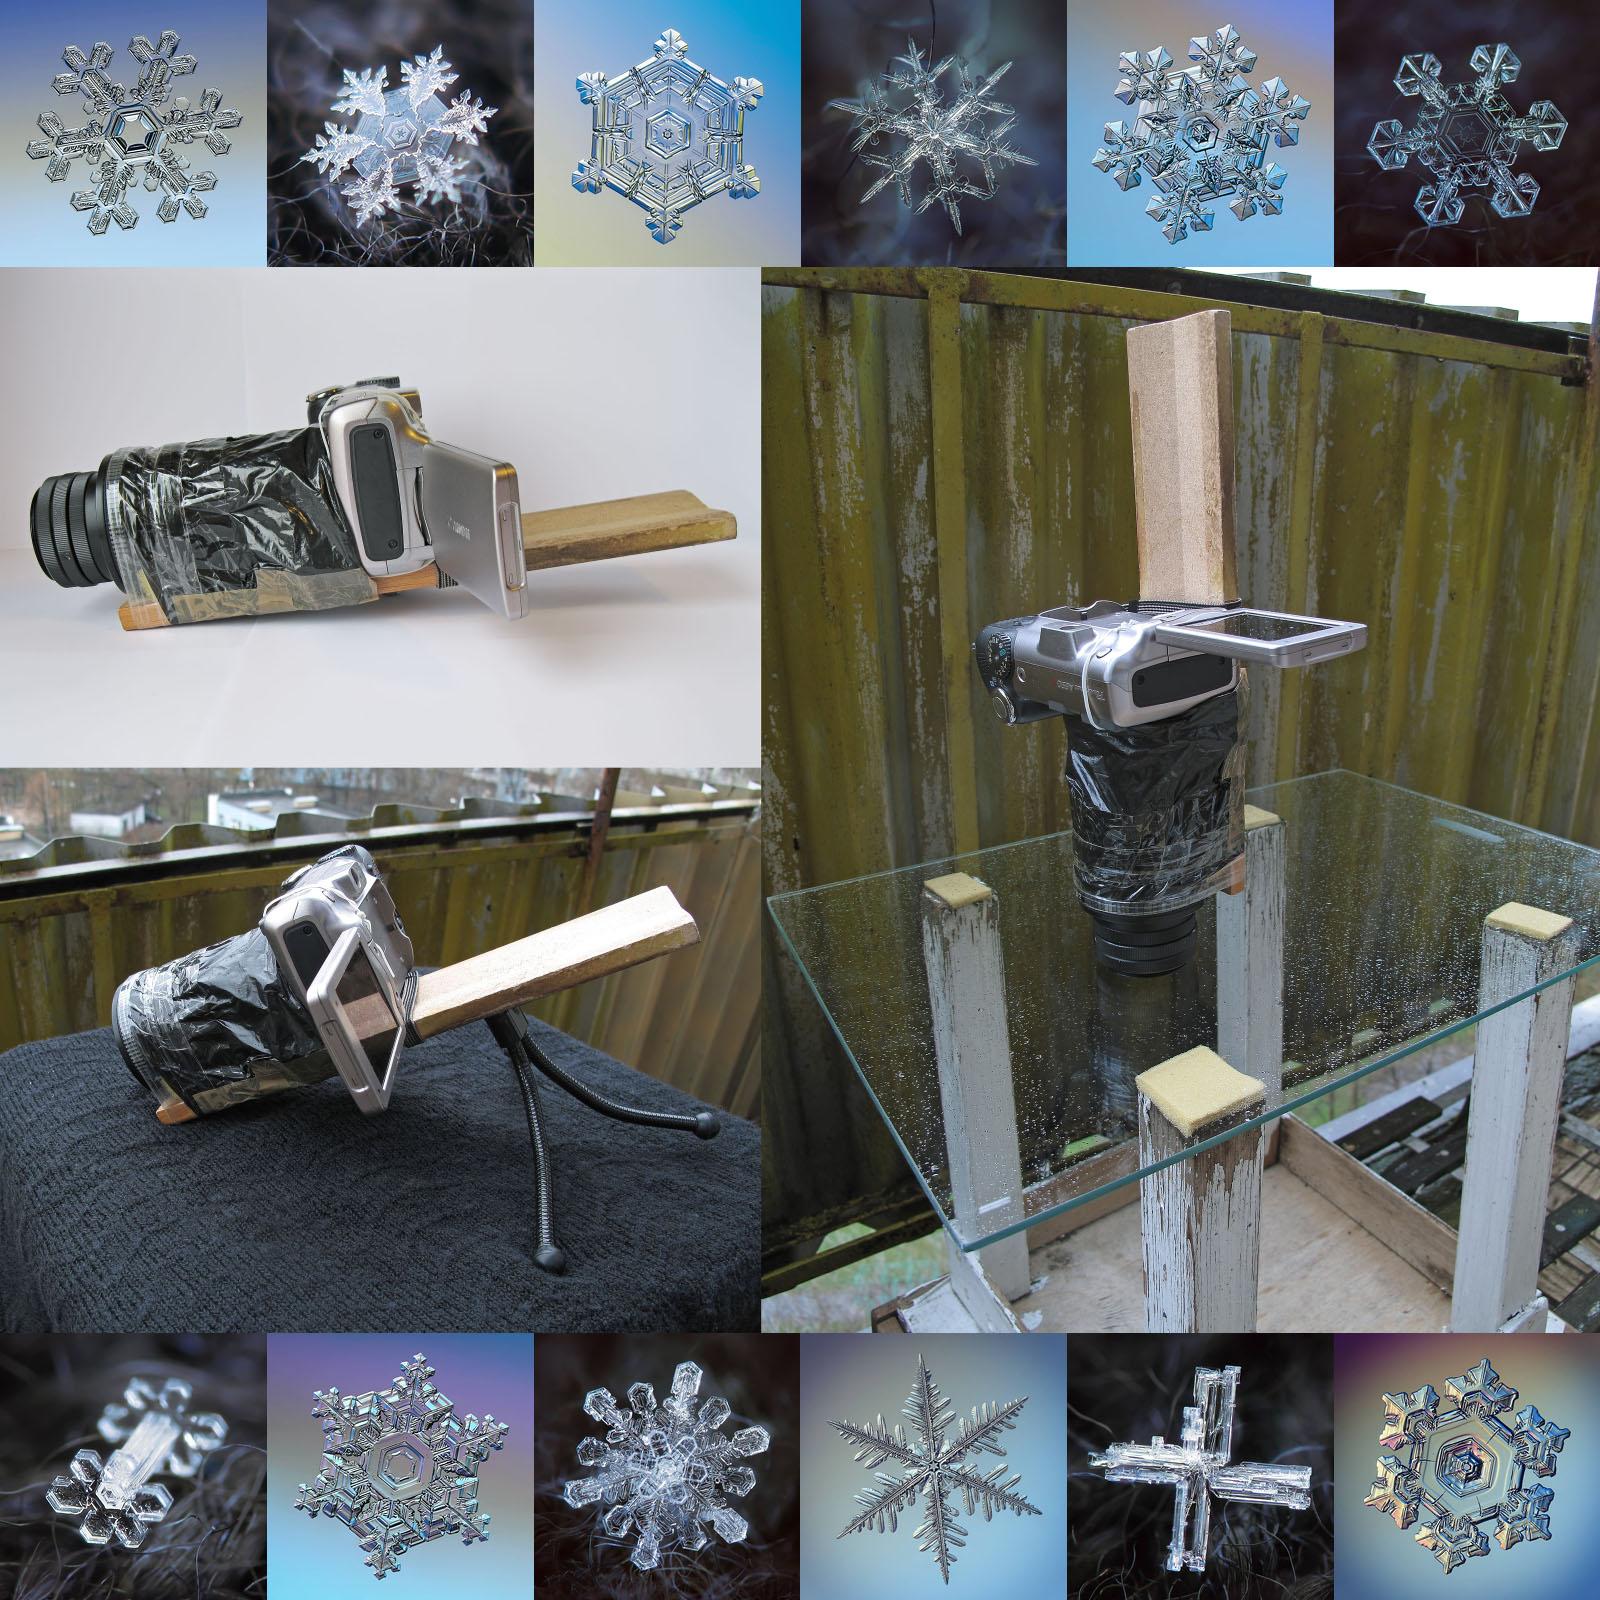 Article about snowflake macro photography - Alexey Kljatov